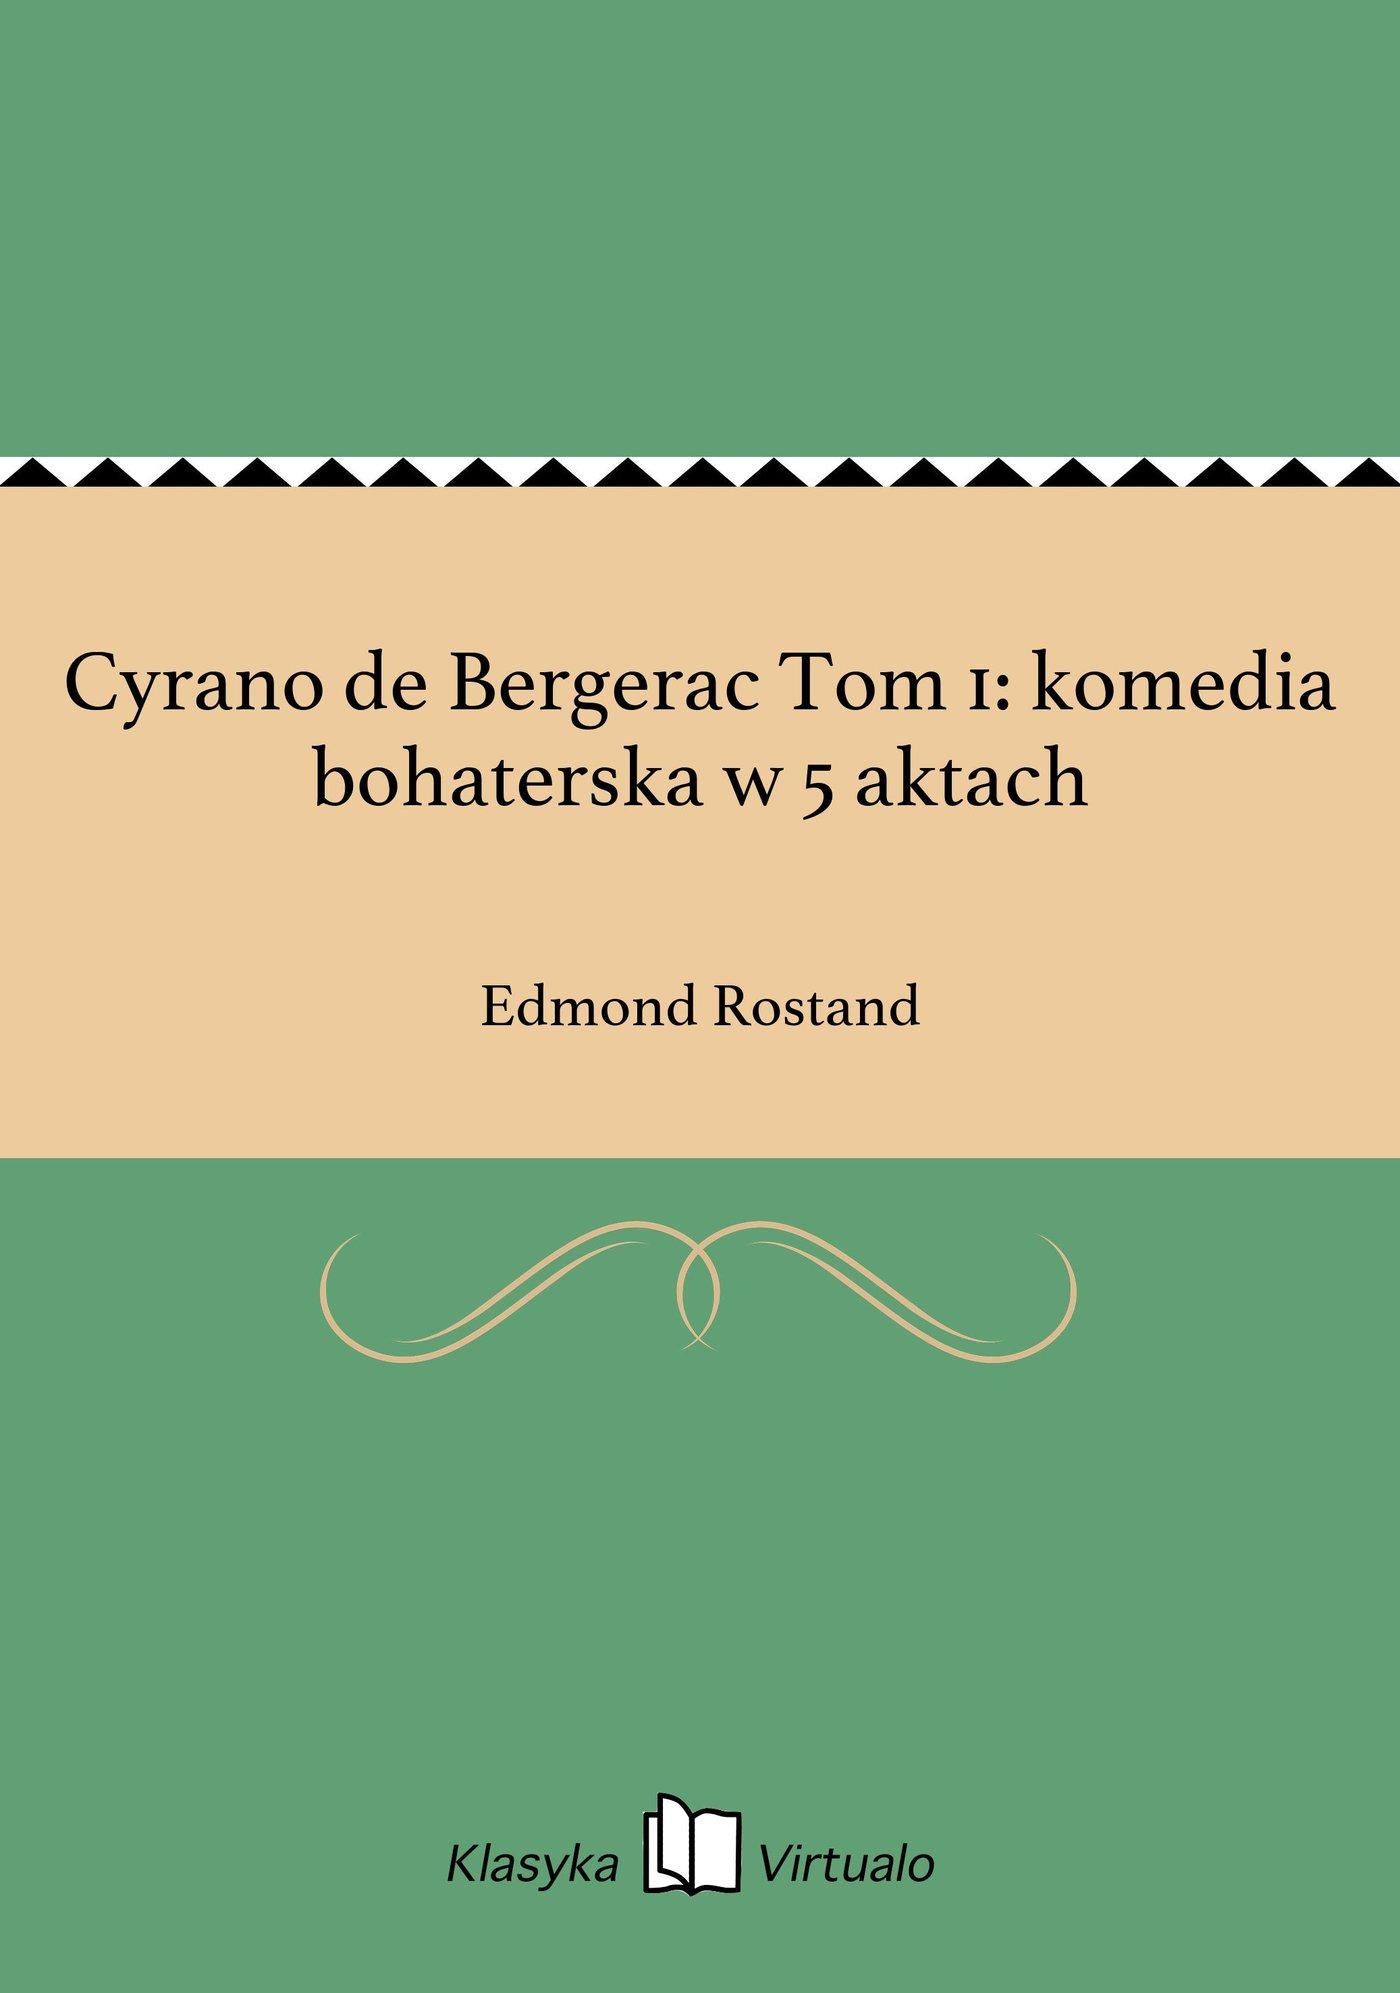 Cyrano de Bergerac Tom 1: komedia bohaterska w 5 aktach - Ebook (Książka na Kindle) do pobrania w formacie MOBI